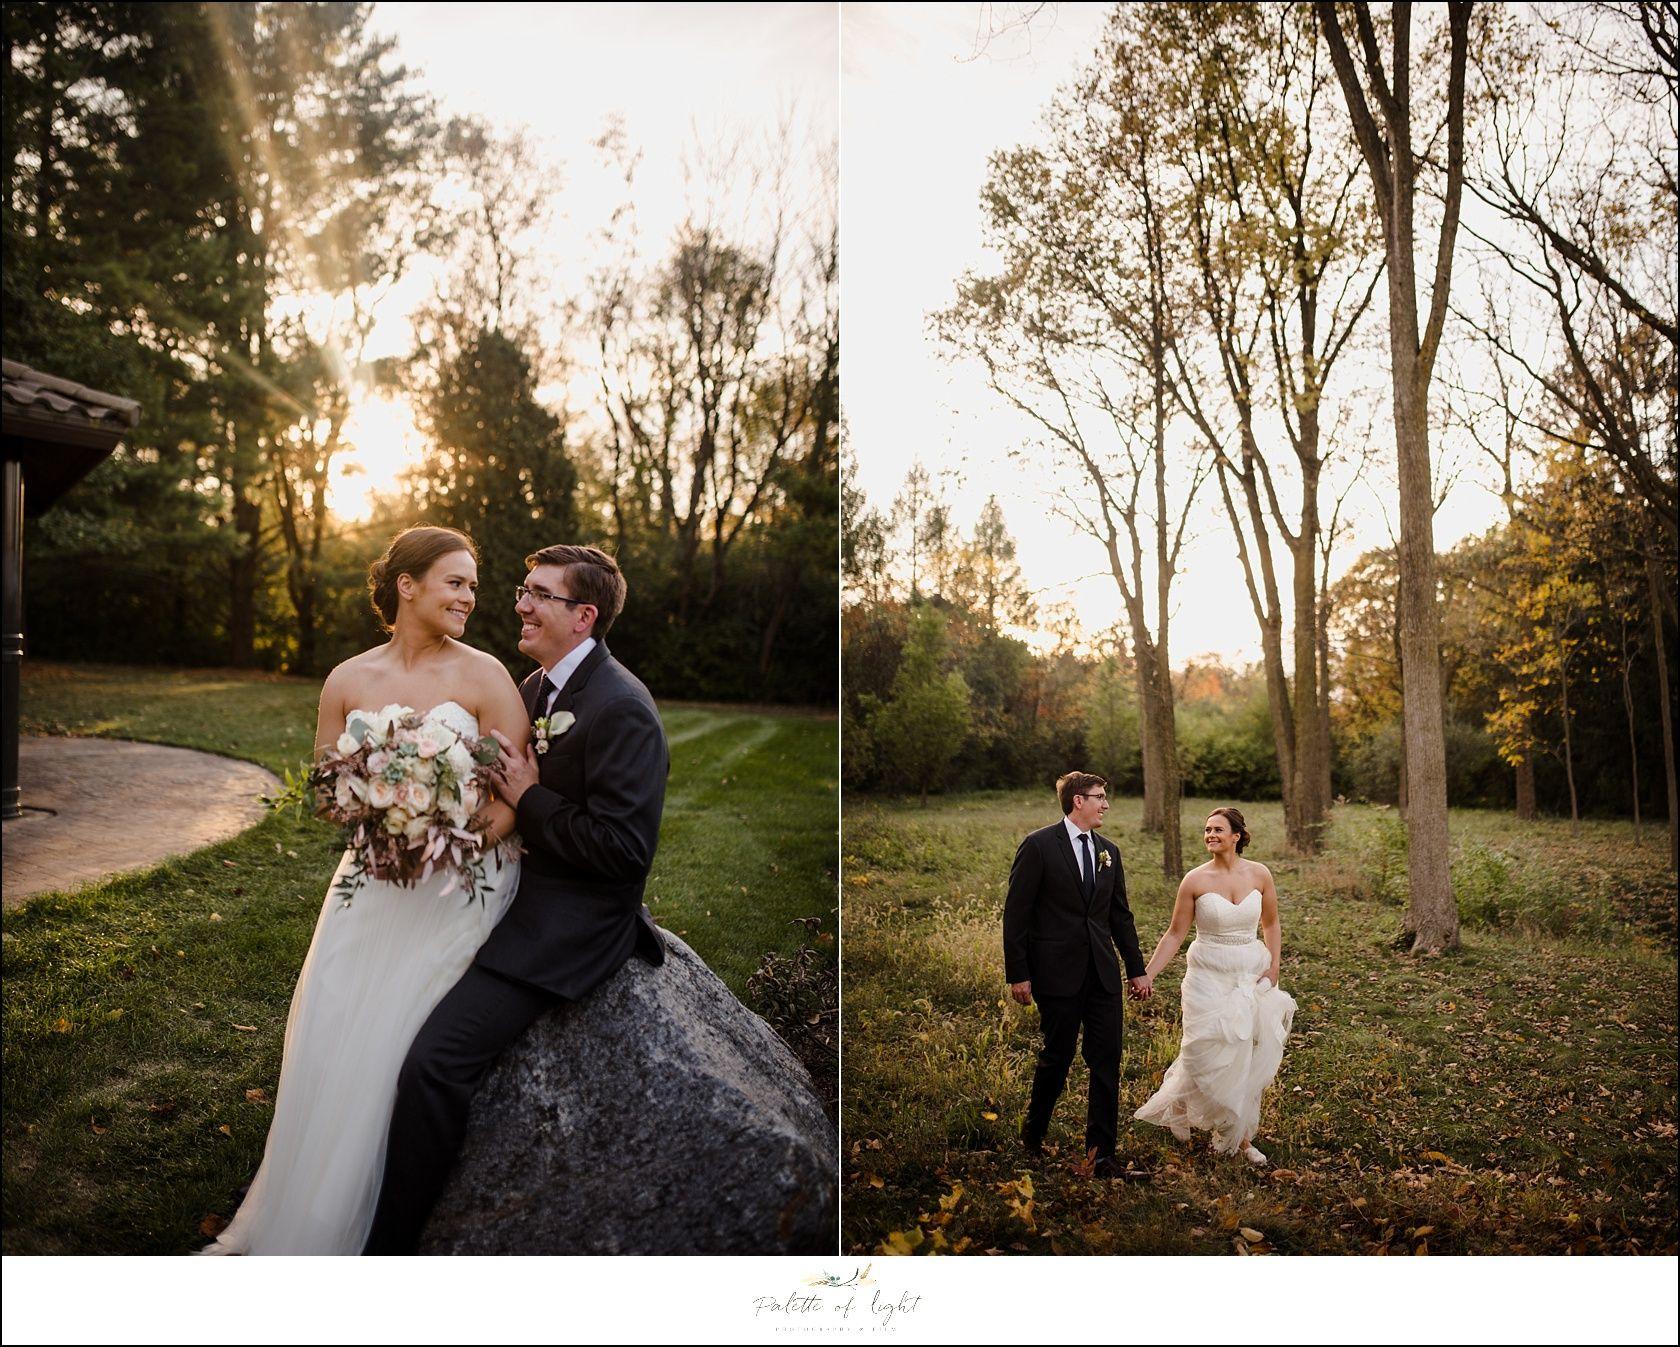 Fall Feels Wedding at Klehm Arboretum | Florists, Reception and Wedding